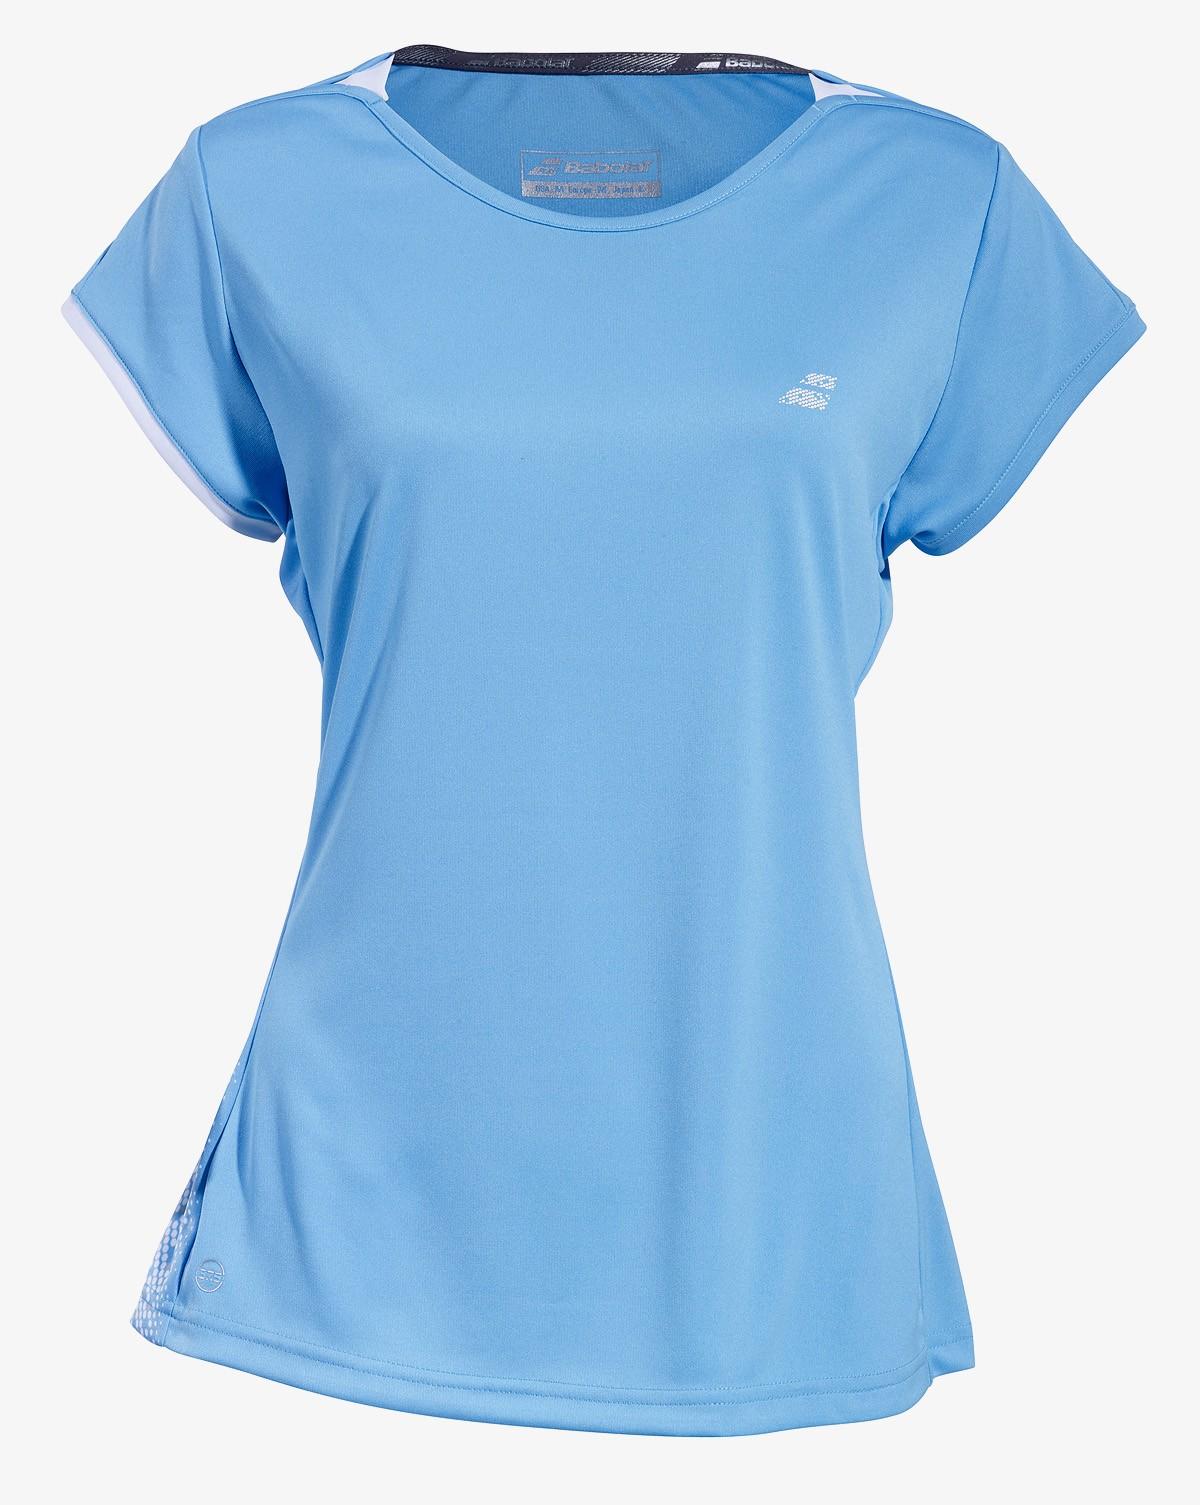 Koszulka tenisowa dziewczęca Babolat PERF Cap Sleeve Horizon Blue -50%